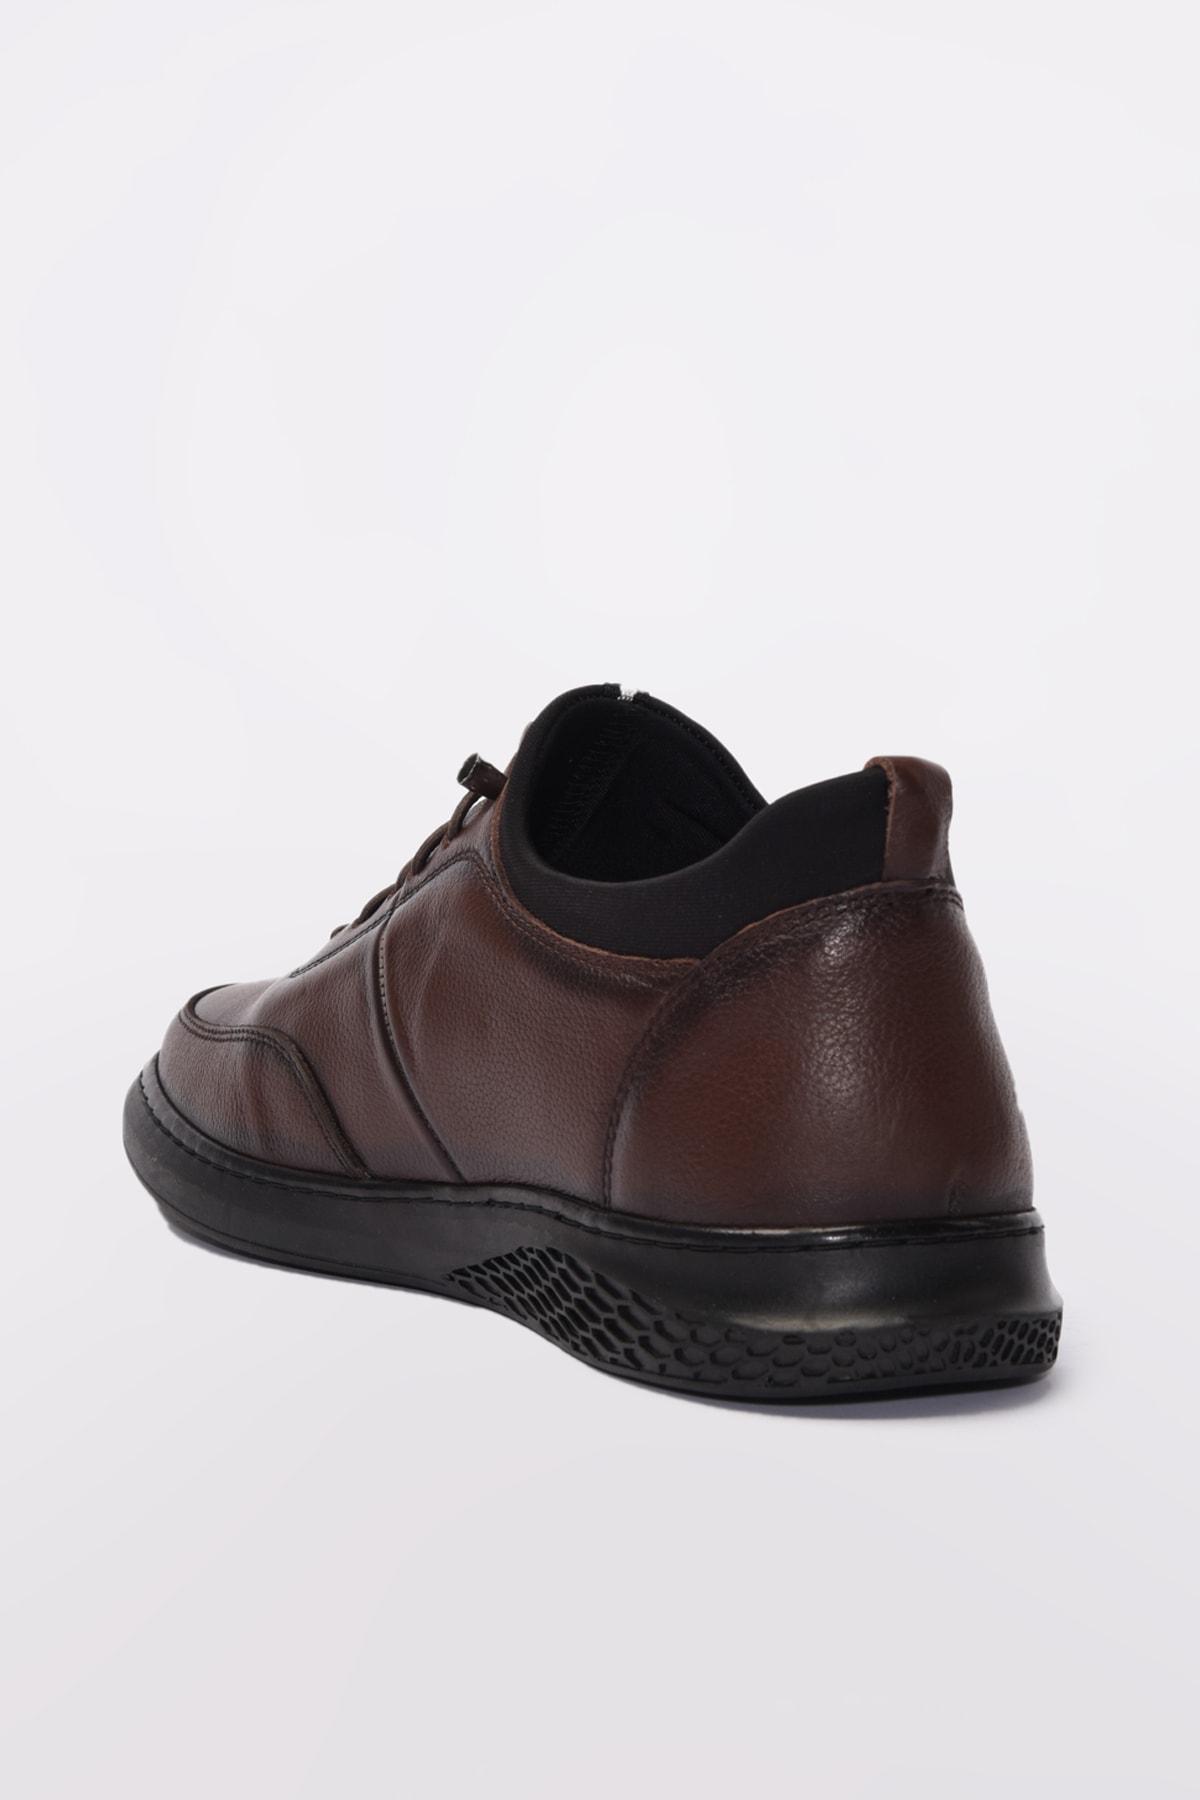 Yaya  by Hotiç Hakiki Deri Kahve Erkek Sneaker 02AYY189610A480 2